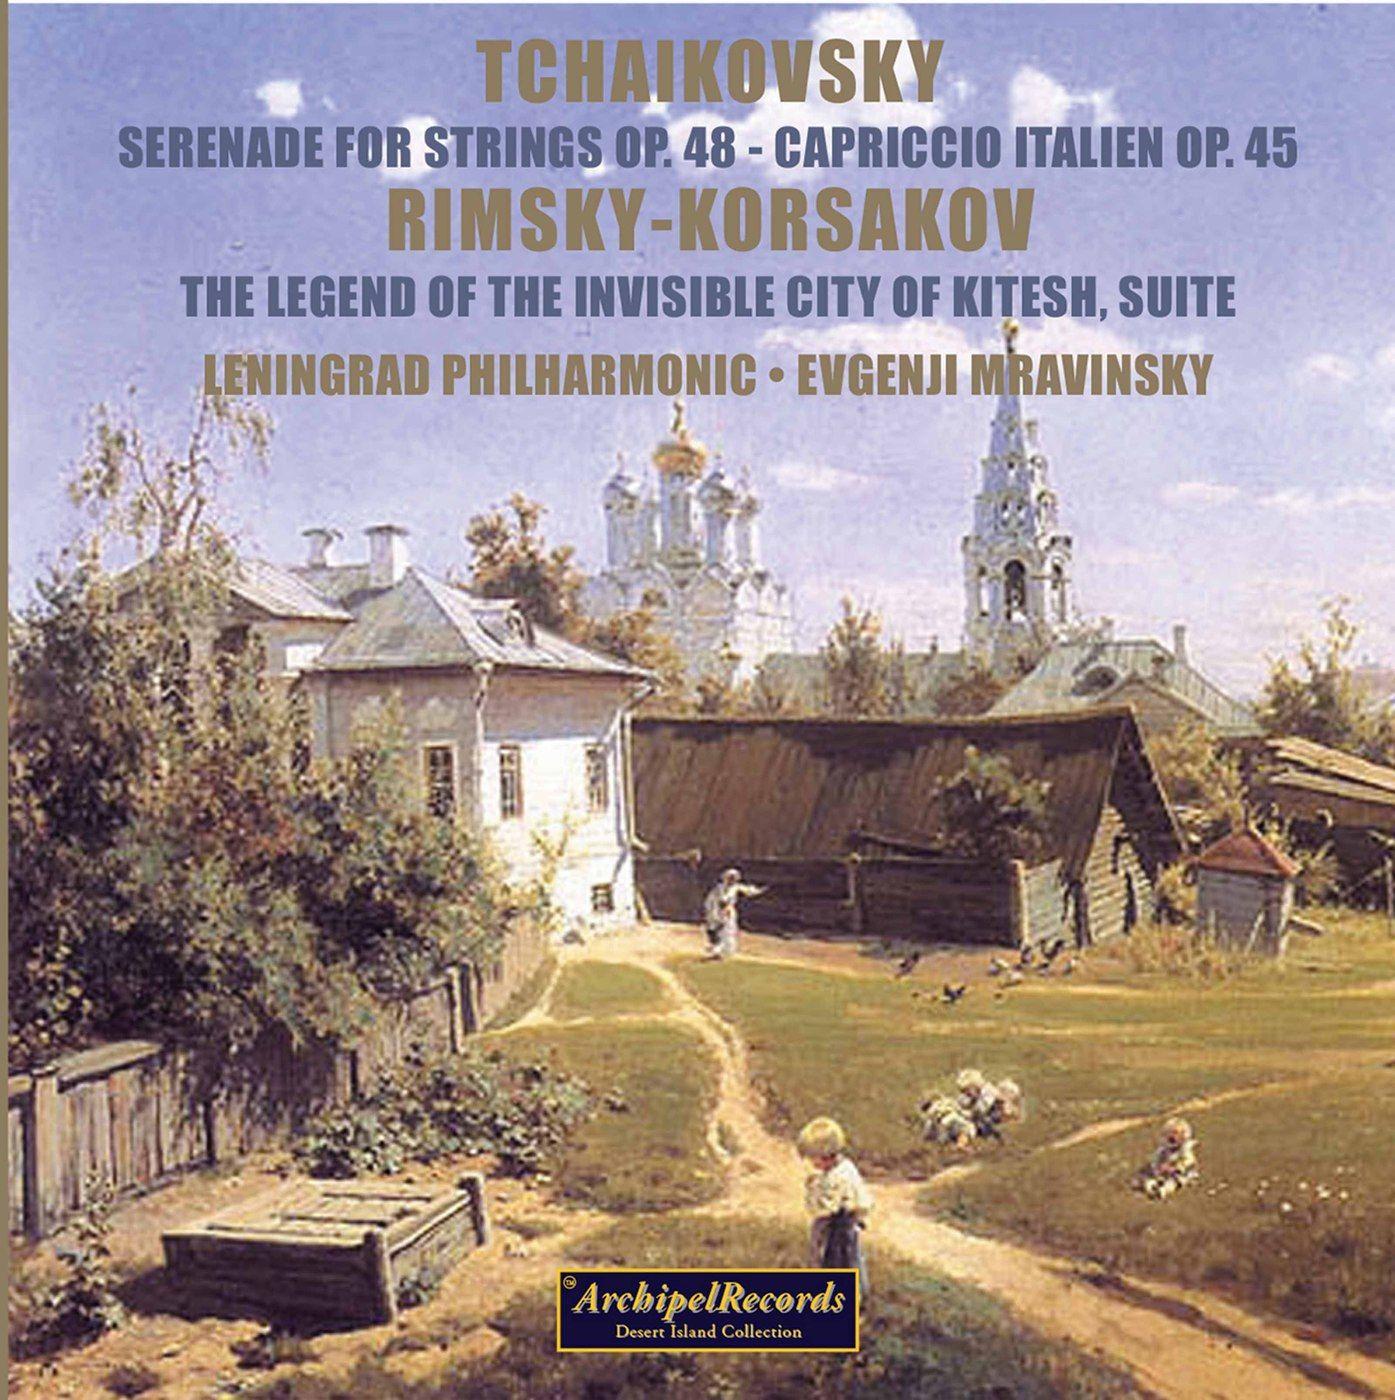 Evgenji Mravinsky conducts Tchaikovsky & Rimsky-Korsakov